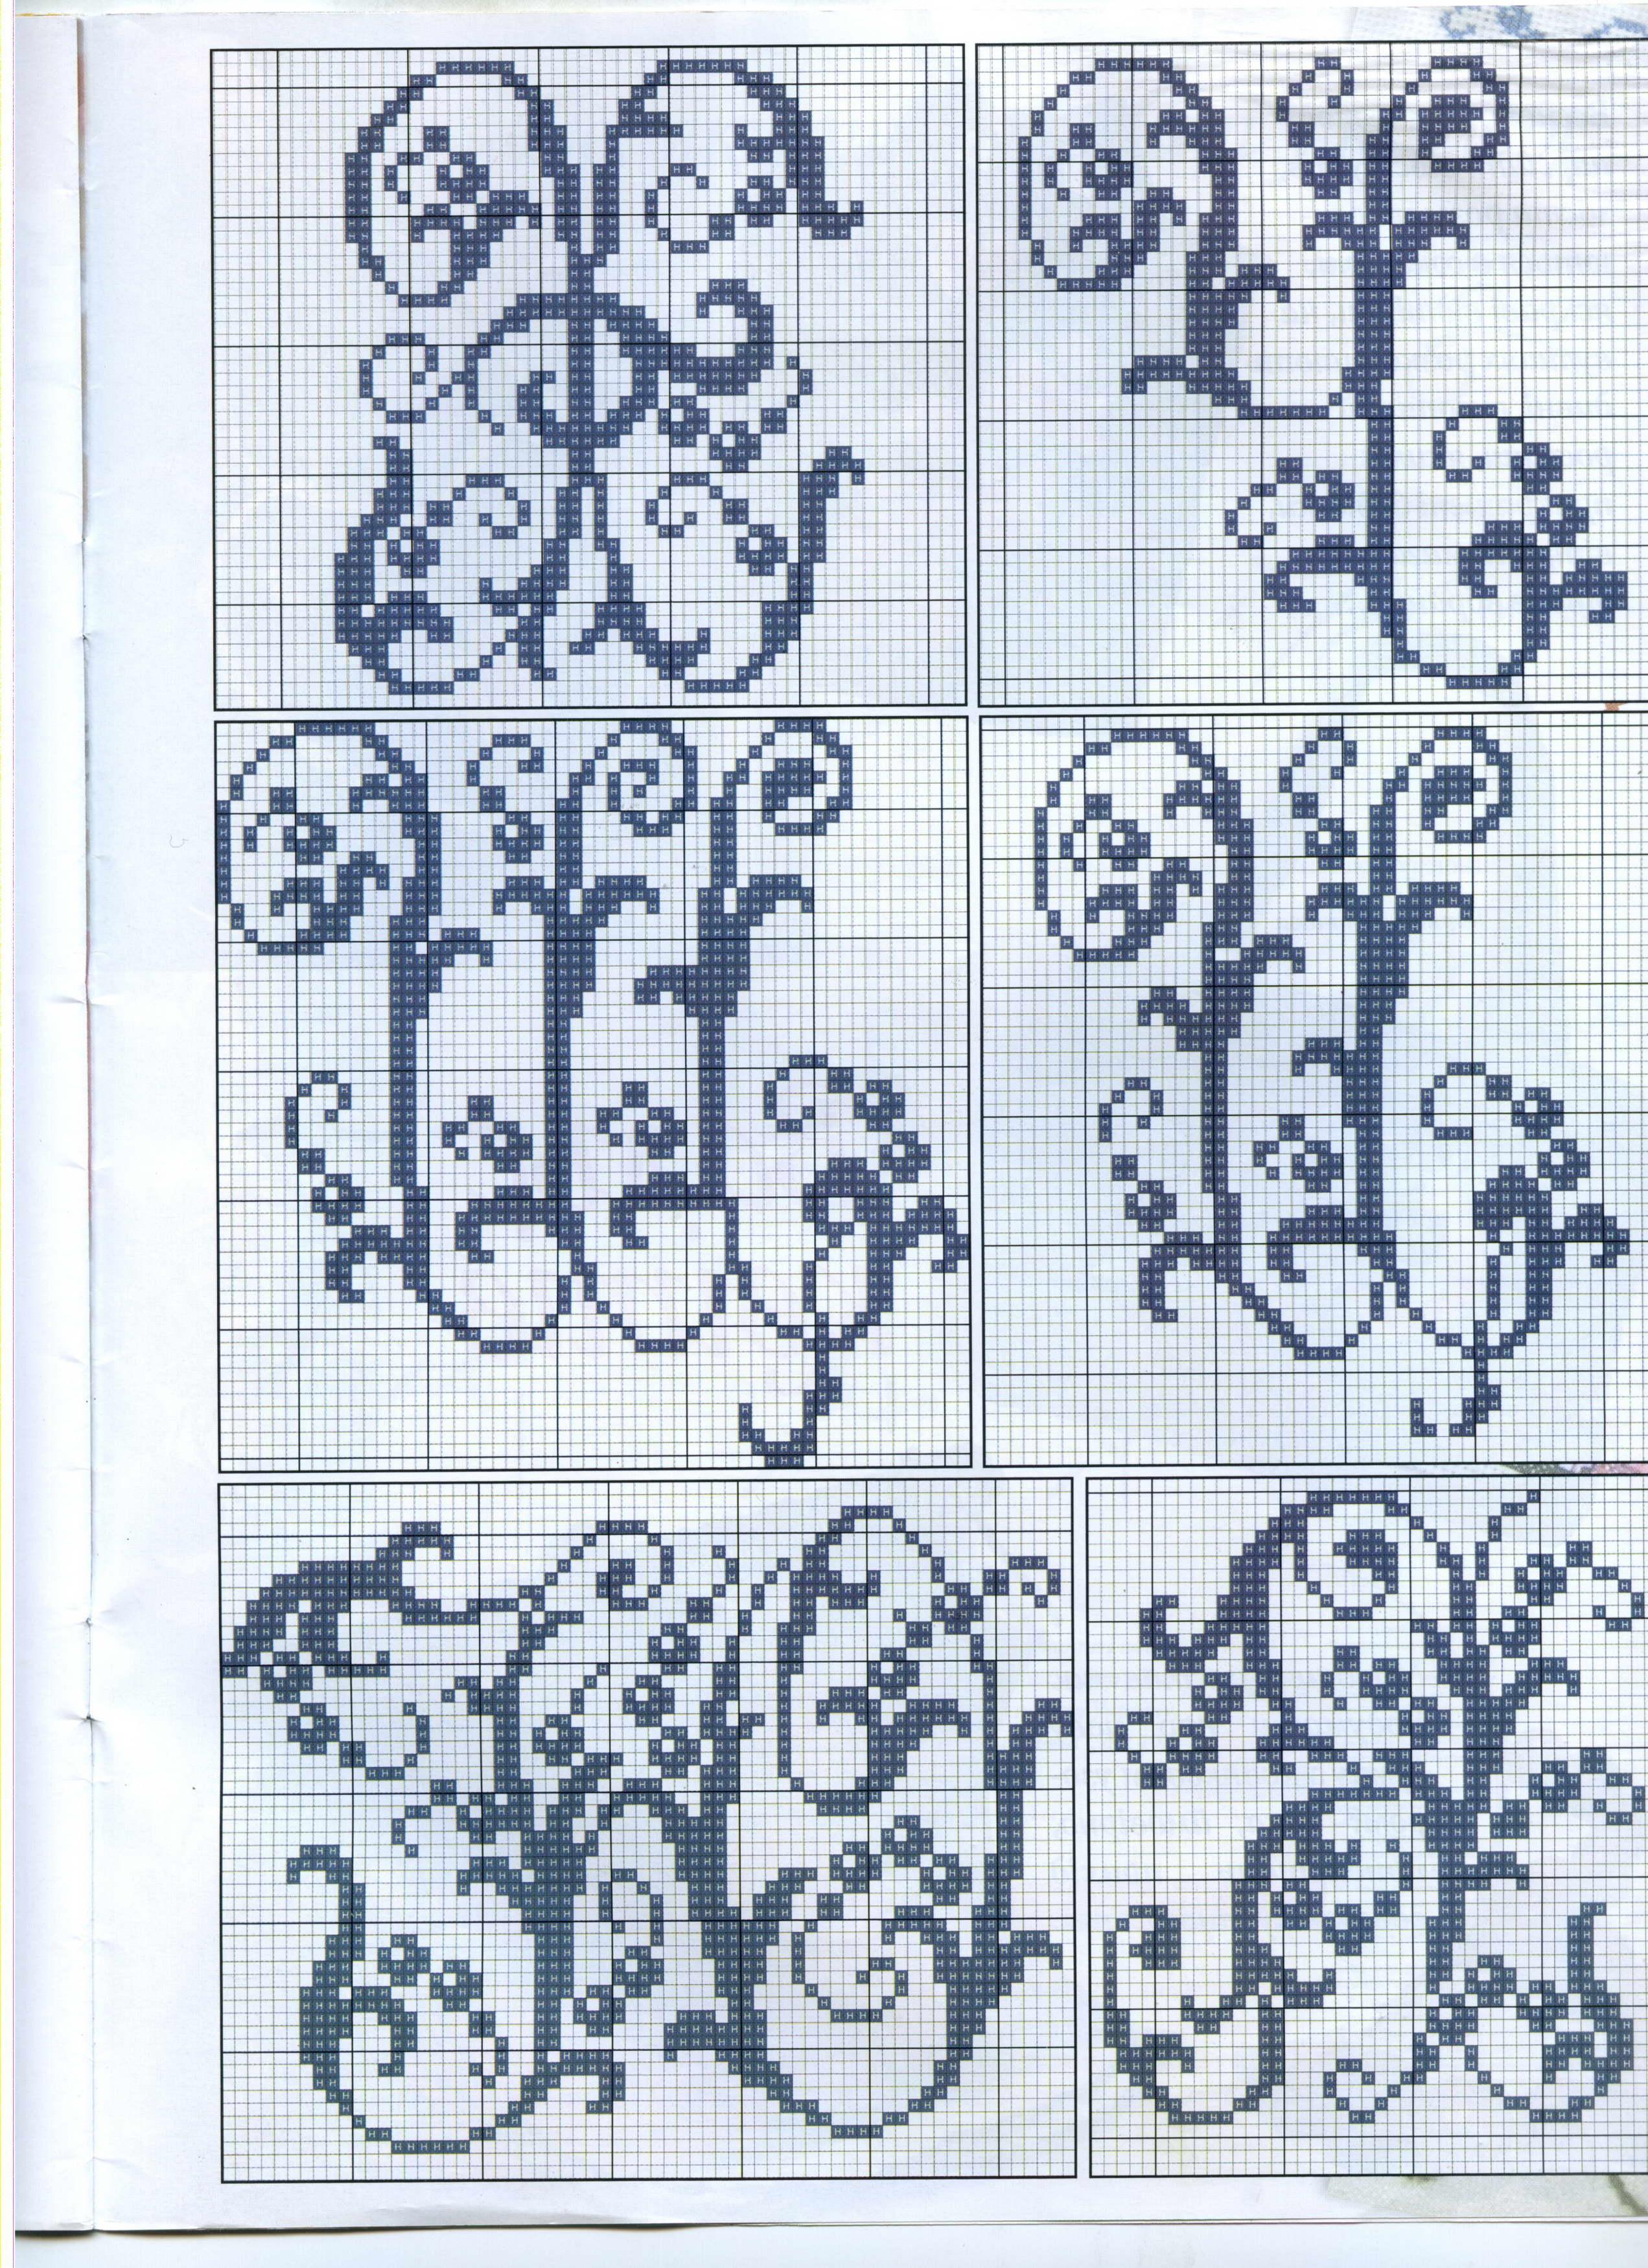 схема букв для вязания спицами английского алфавита